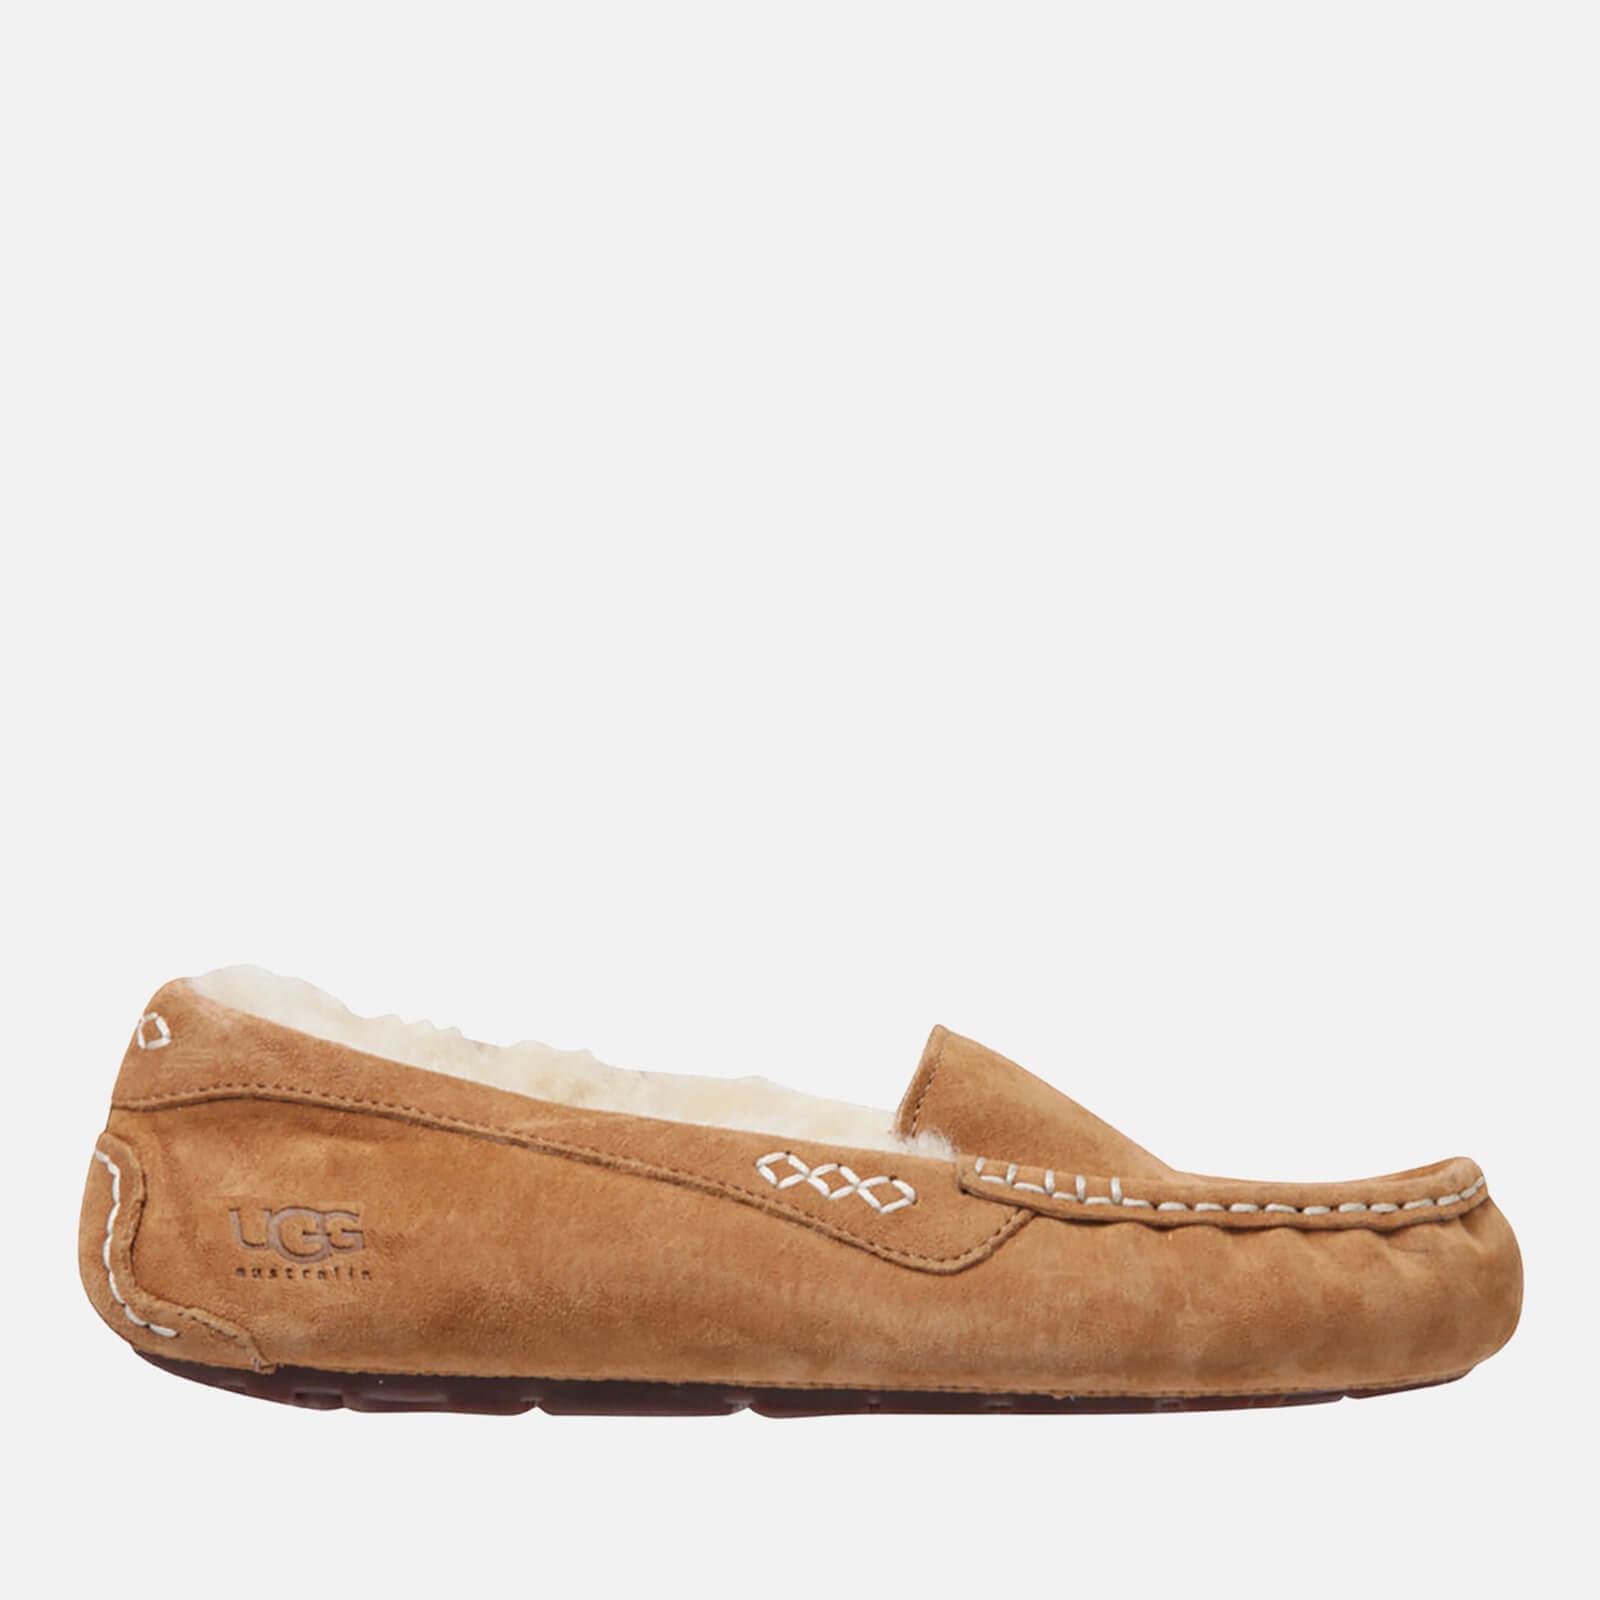 UGG Women's Ansley Moccasin Suede Slippers - Chestnut - UK 4